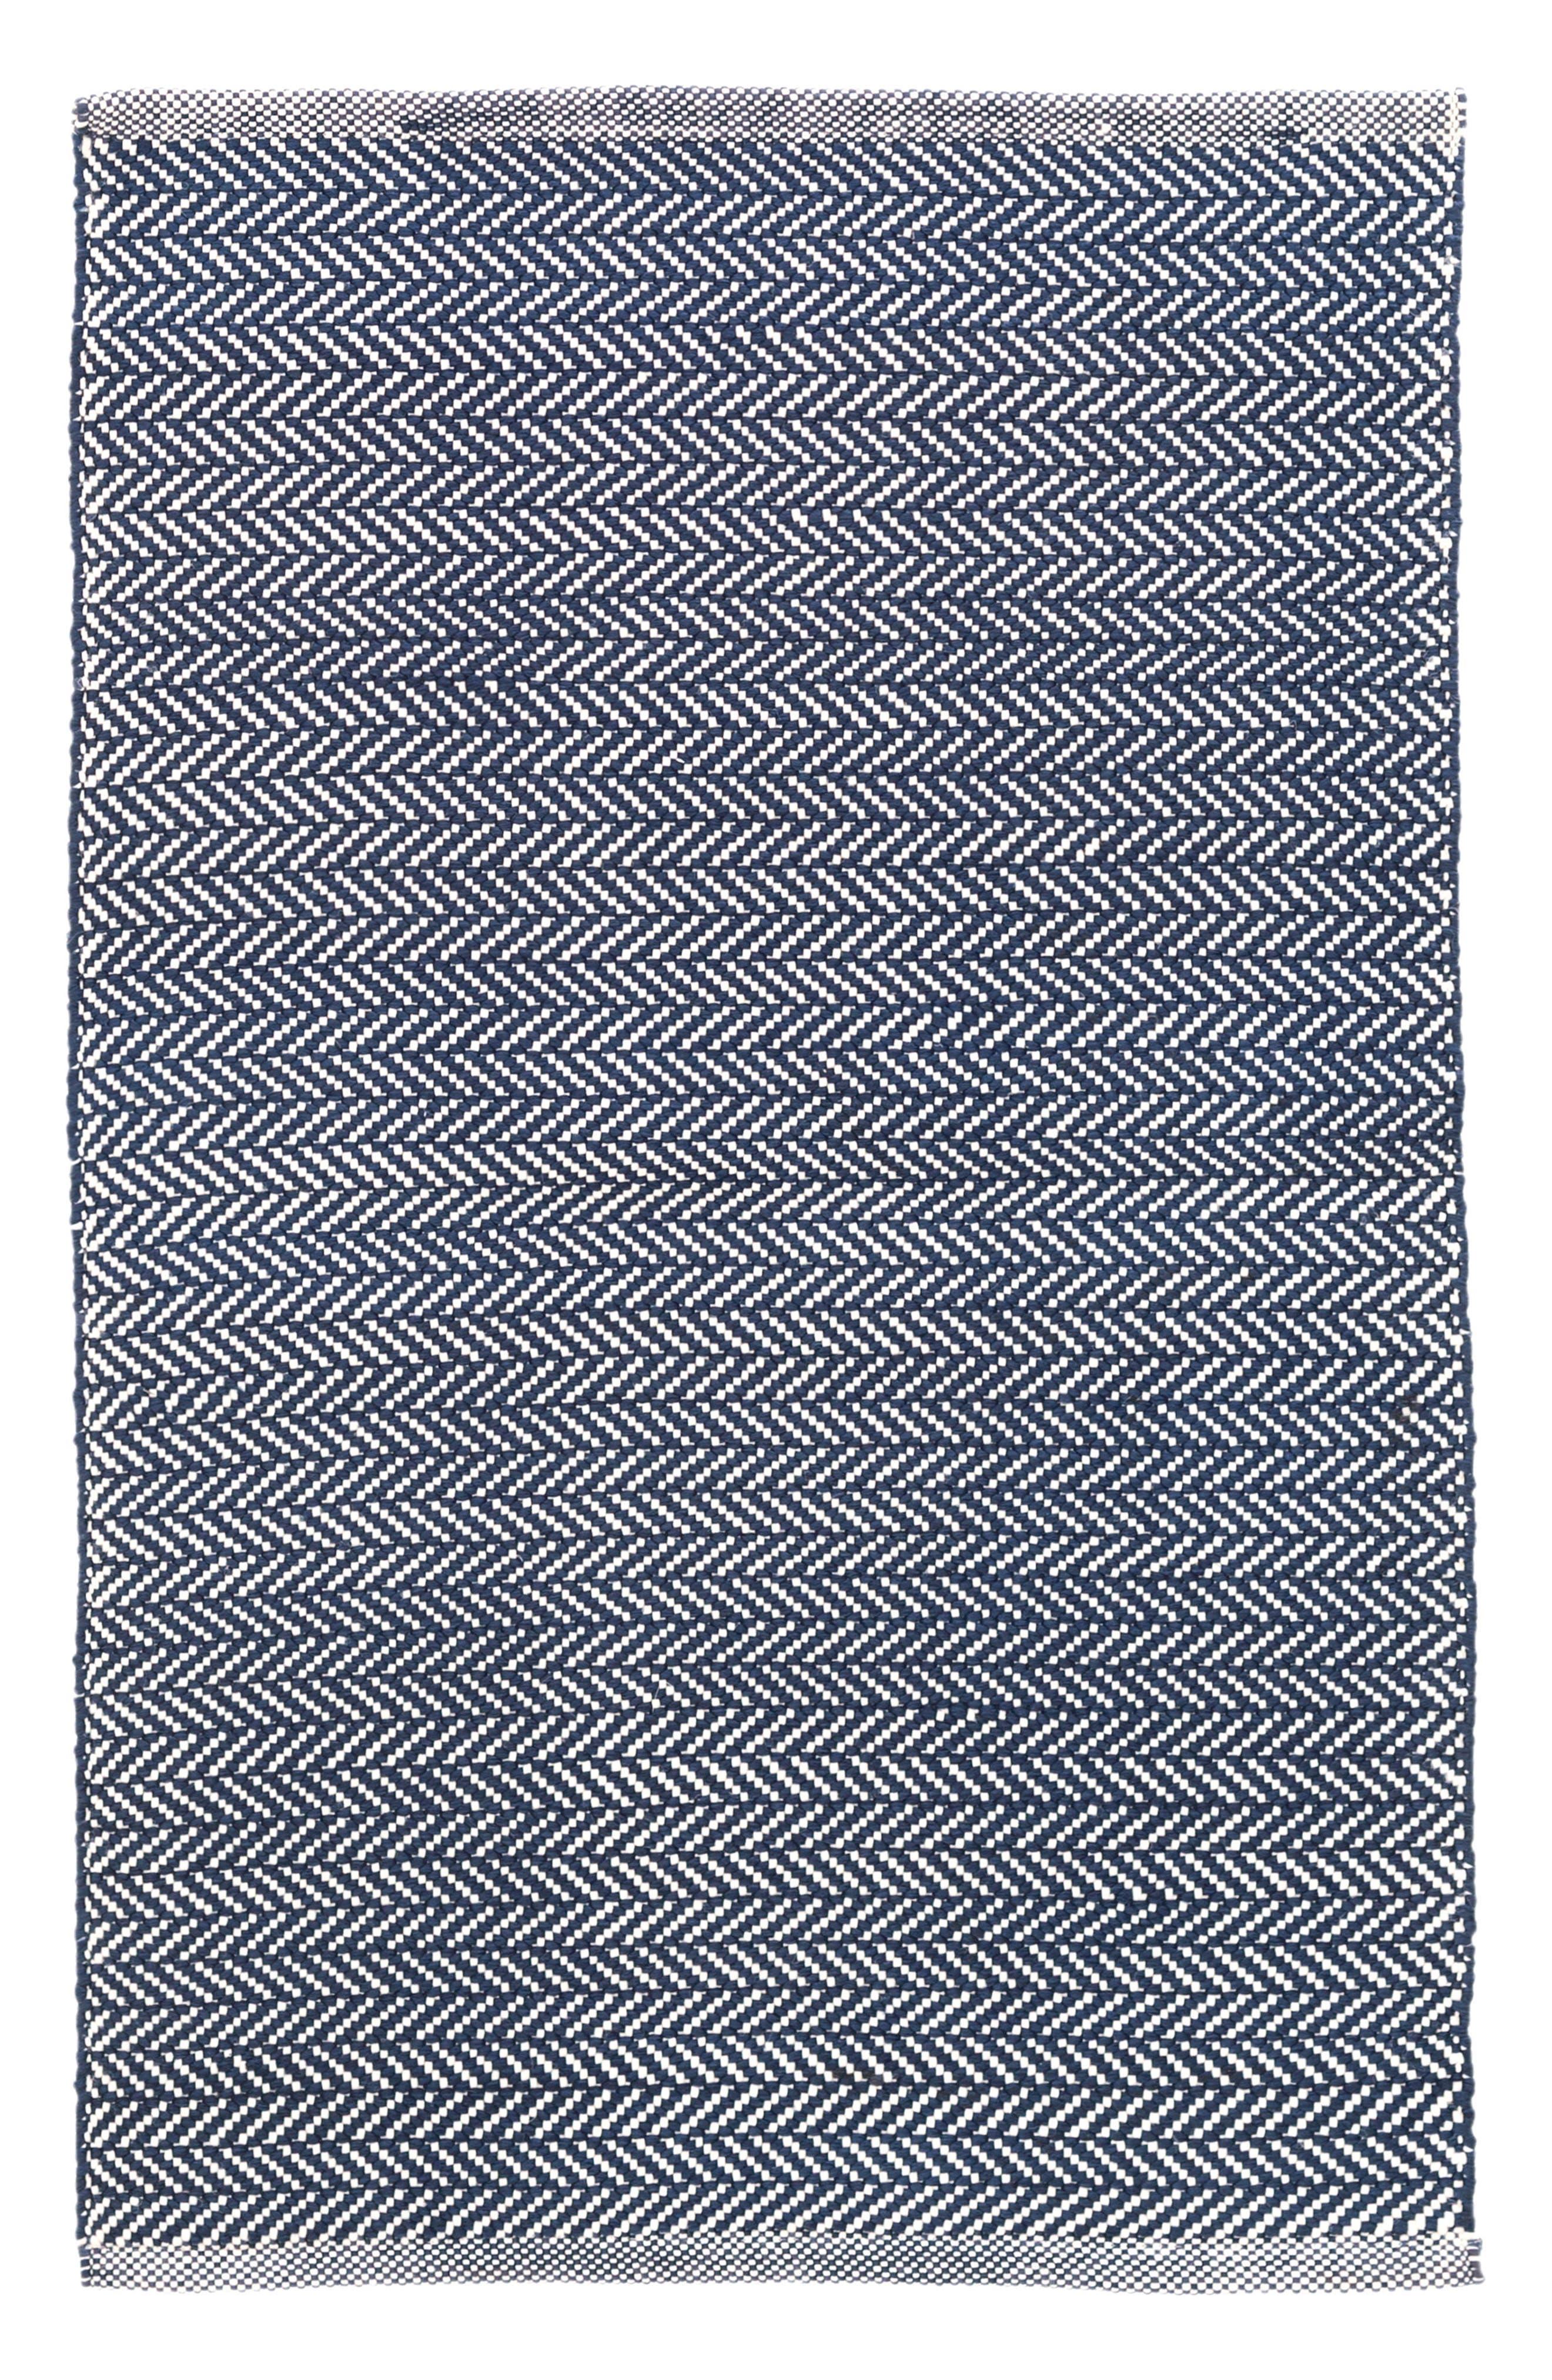 Herringbone Rug,                         Main,                         color, Indigo